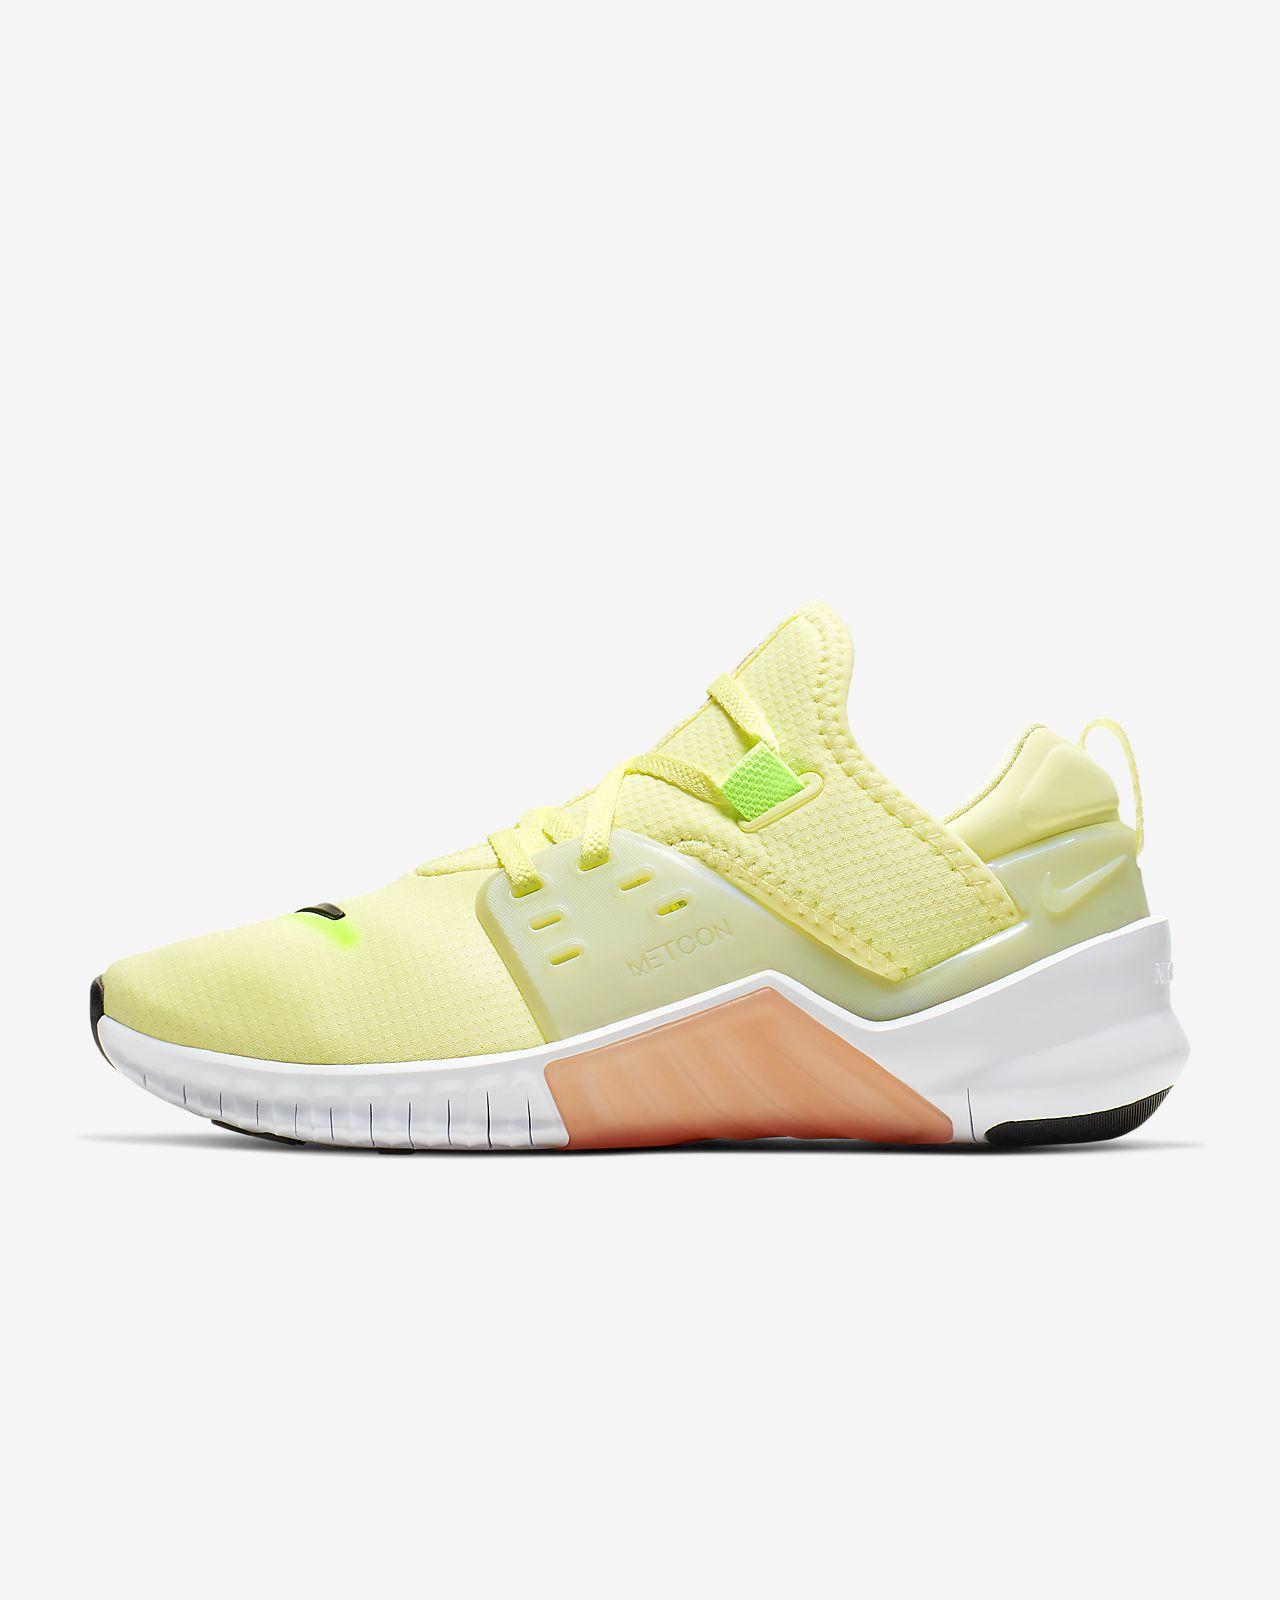 Chaussure de training Nike Free Metcon 2 AMP pour Femme